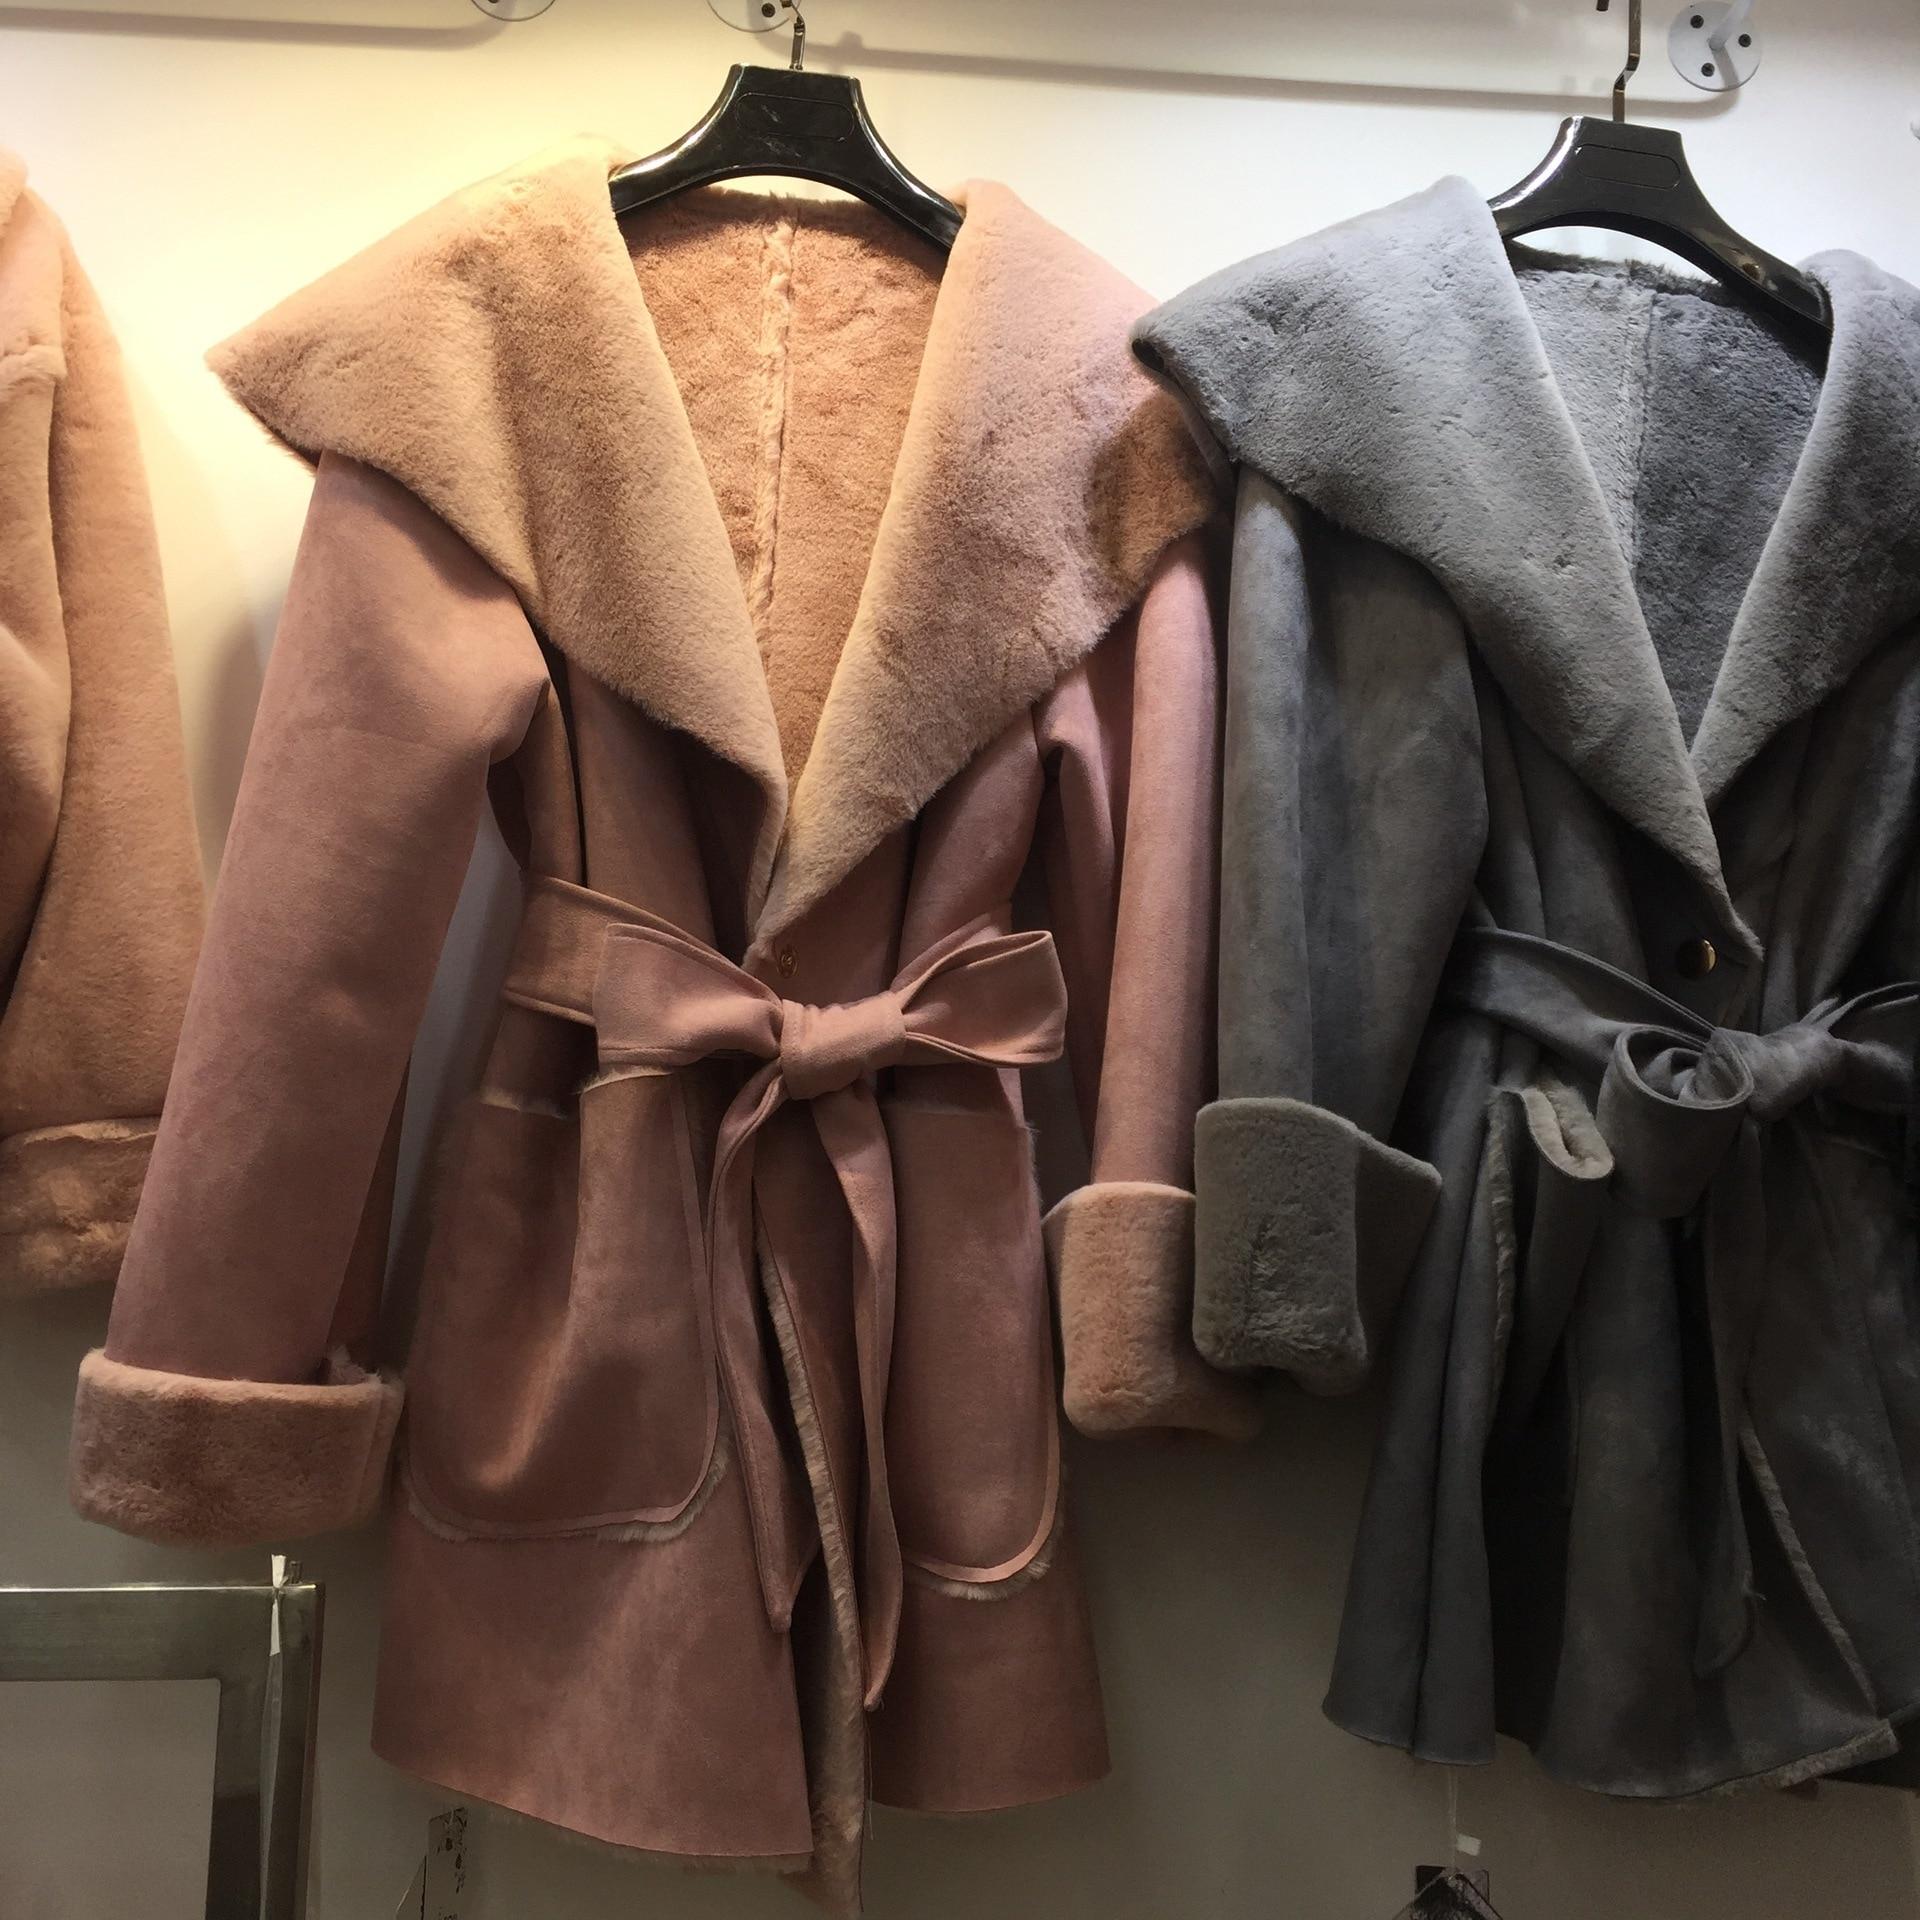 Suede Fur Coat Women Winter Long 2017 Korean Style Large Lapel Warm Faux Fur Coats with Belt Female Solid Loose Overcoats manitobah перчатки suede mitt with fur trim lg charcoal св серый